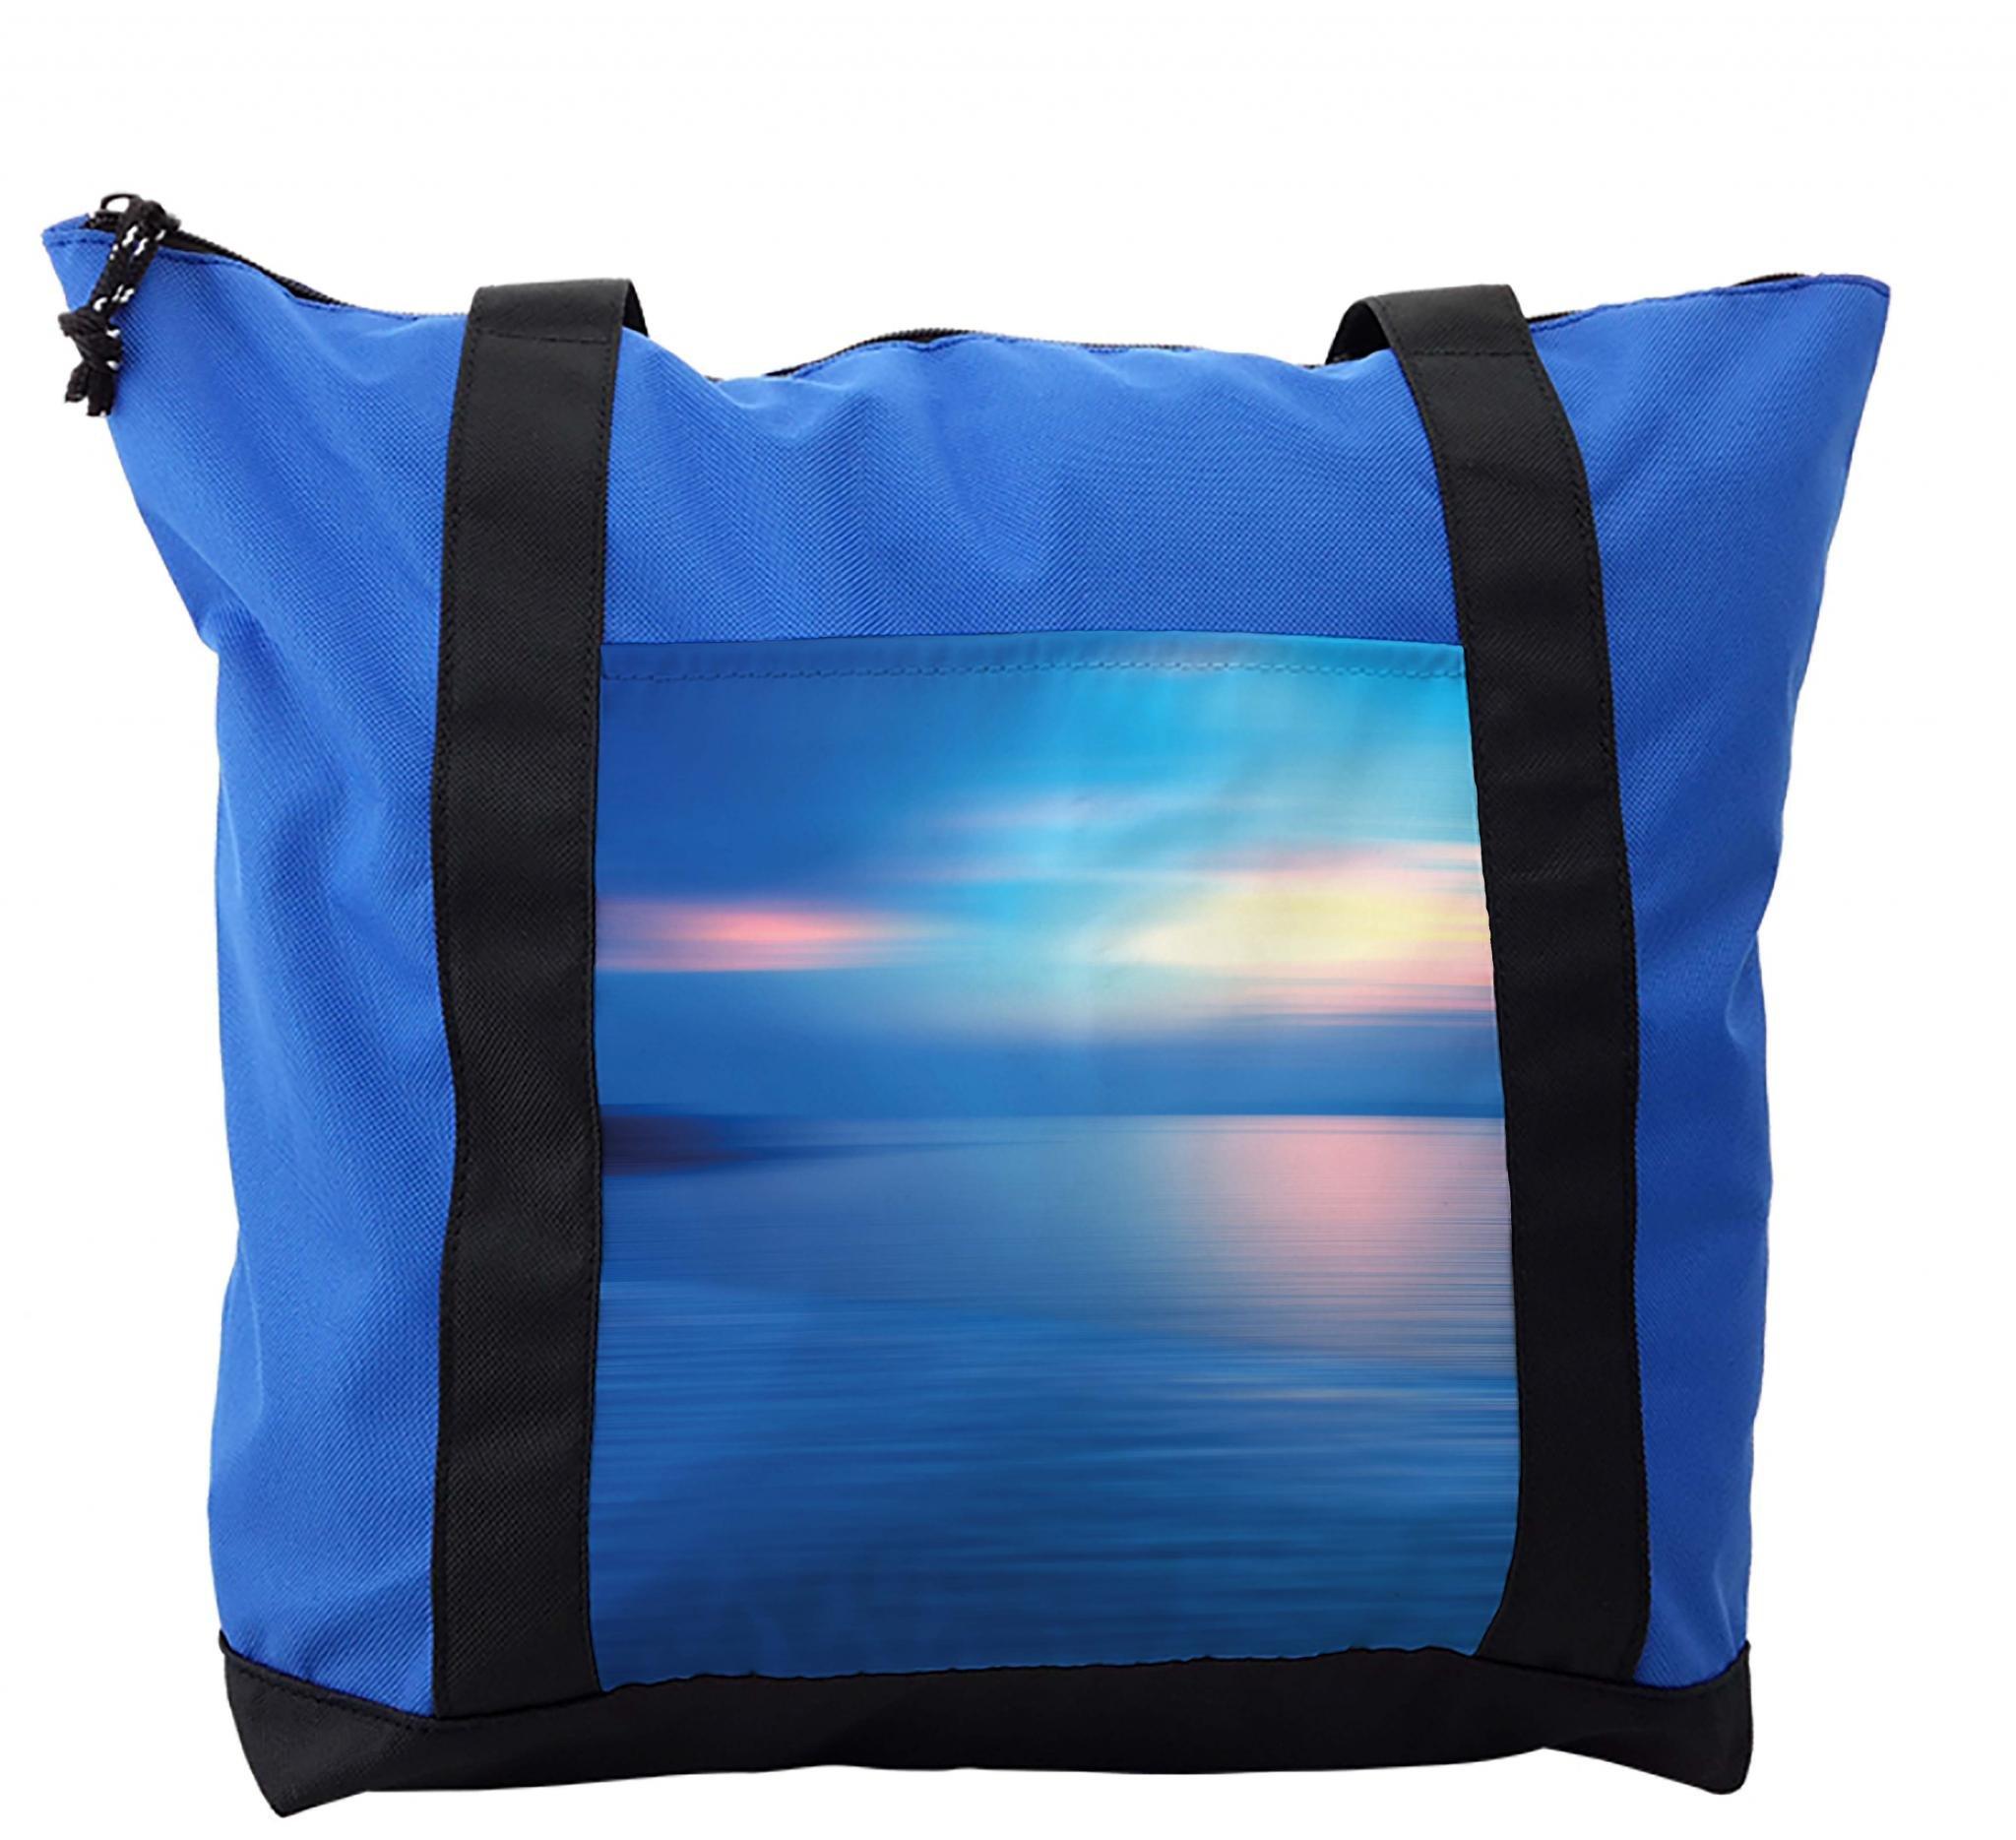 Lunarable Landscape Shoulder Bag, Panoramic Ocean Scene, Durable with Zipper